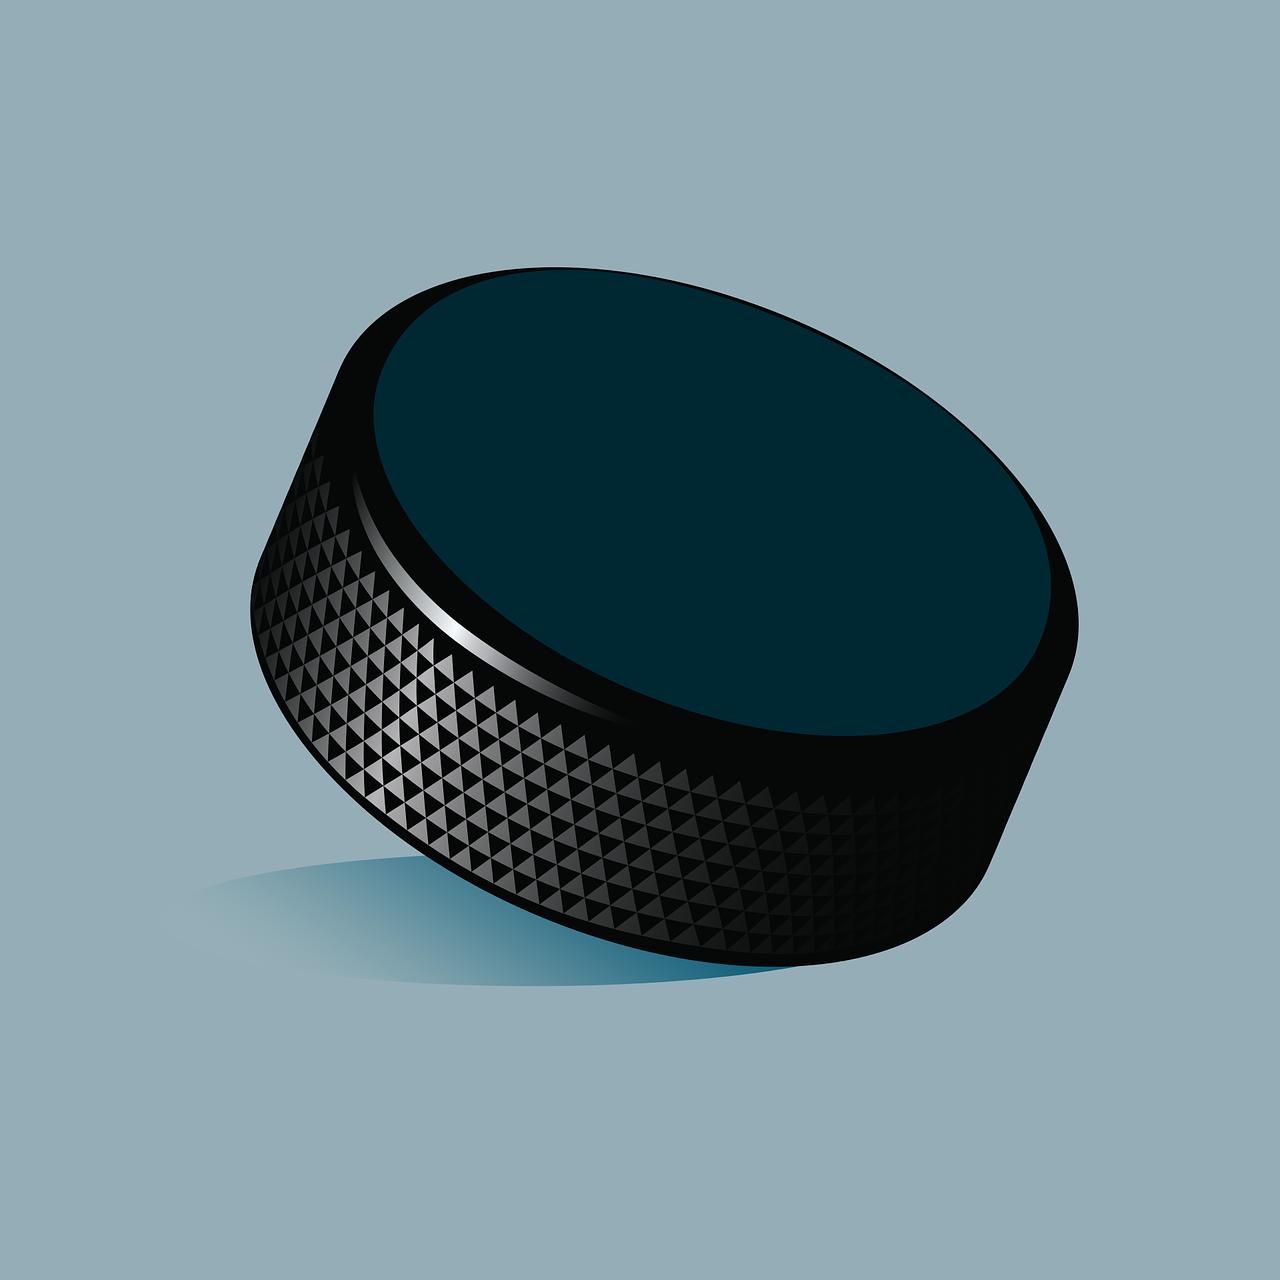 hockey-puck-1477440_1280